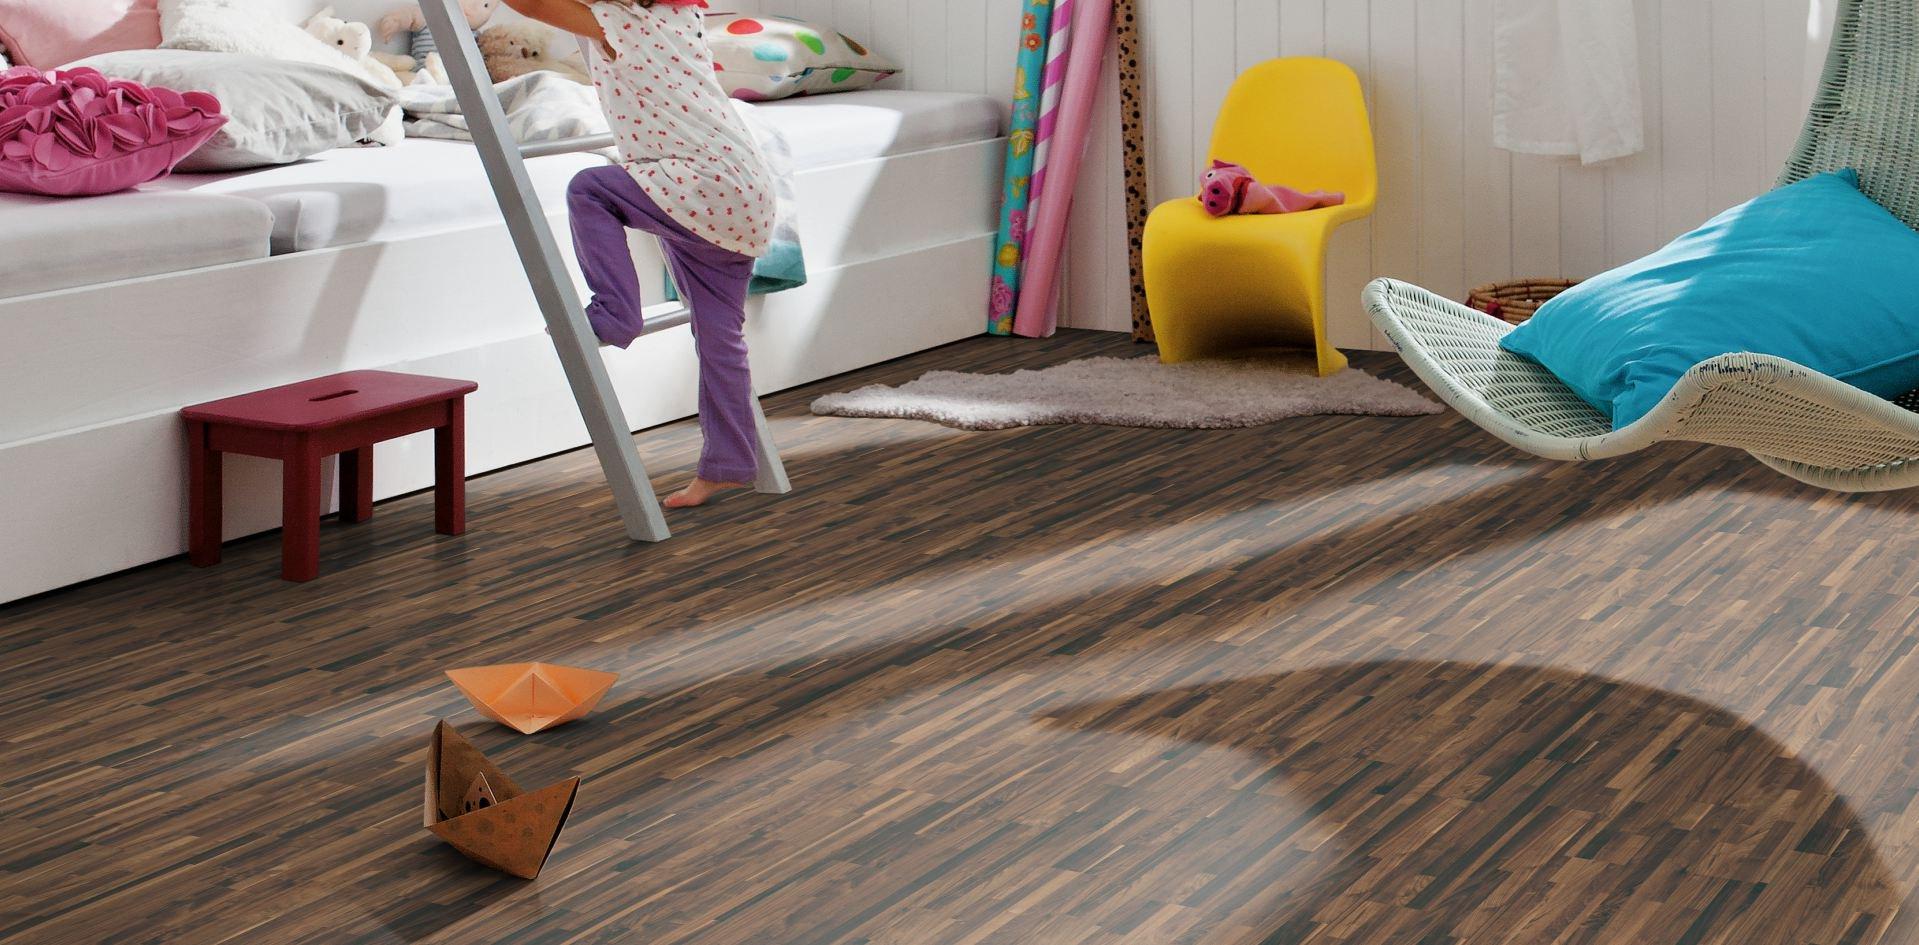 haro cork floors arteo and arteo xl in parquet look haro. Black Bedroom Furniture Sets. Home Design Ideas